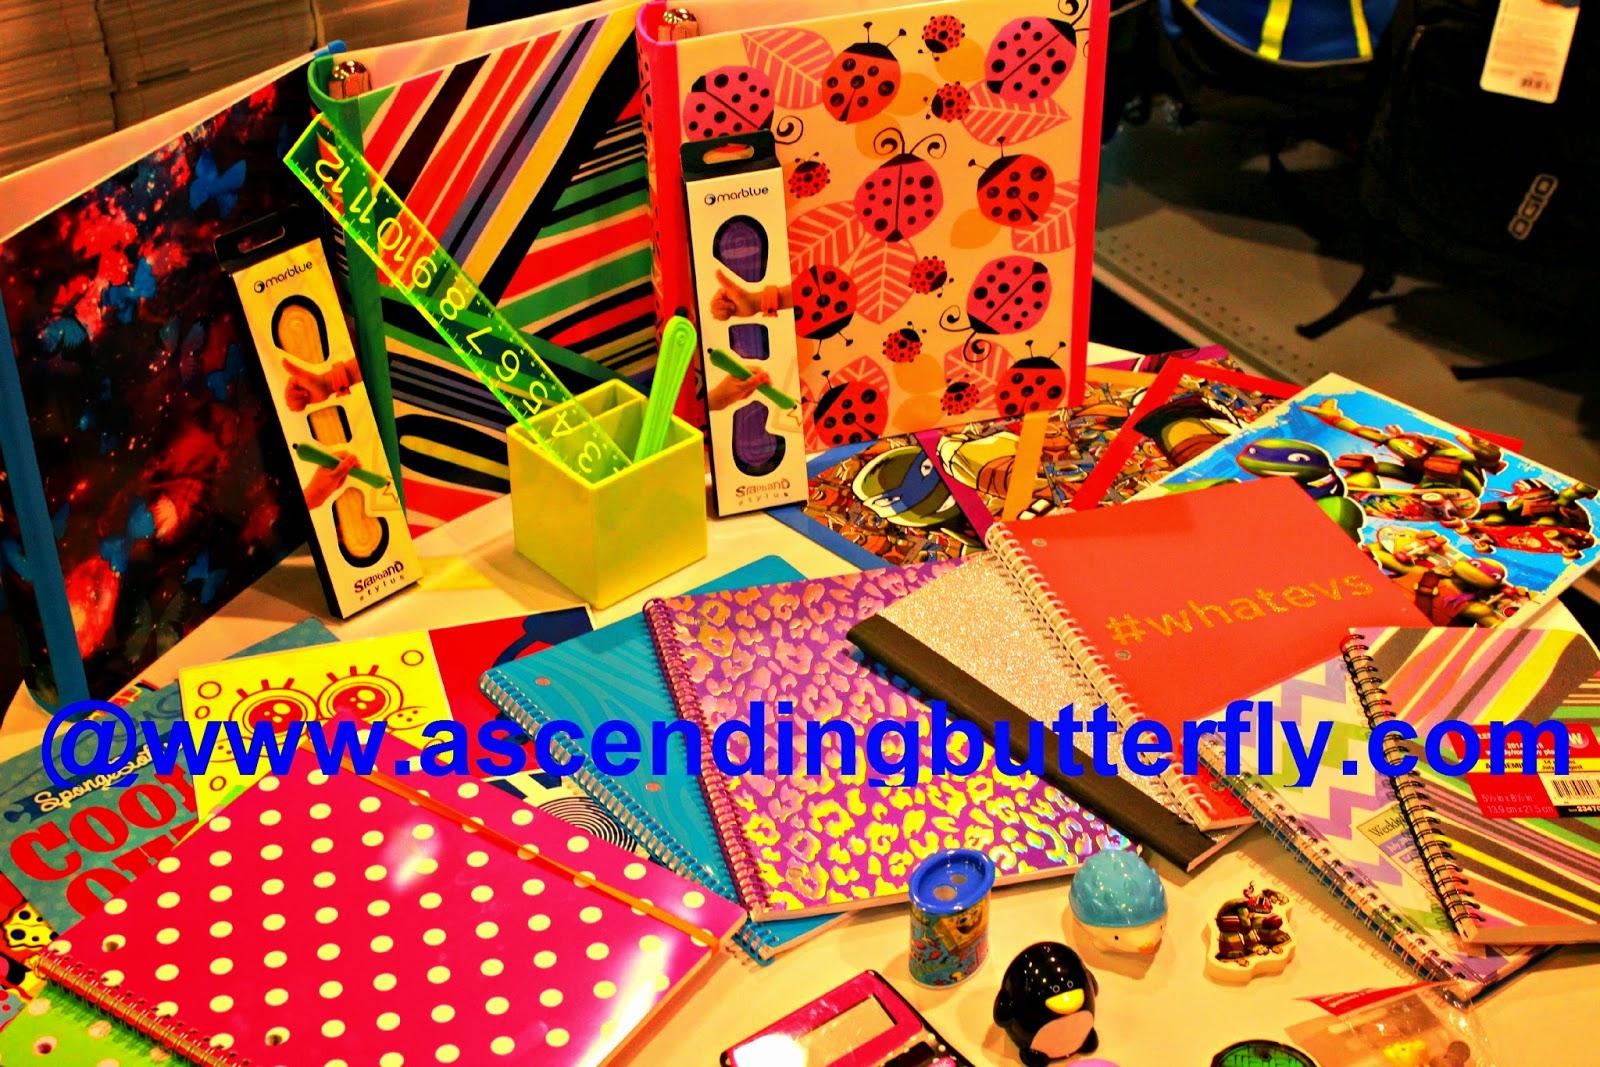 Teenage Mutant Ninja Turtles Folders? Check, #Whatevs Notebook? Check Ladybug Binders? Check!